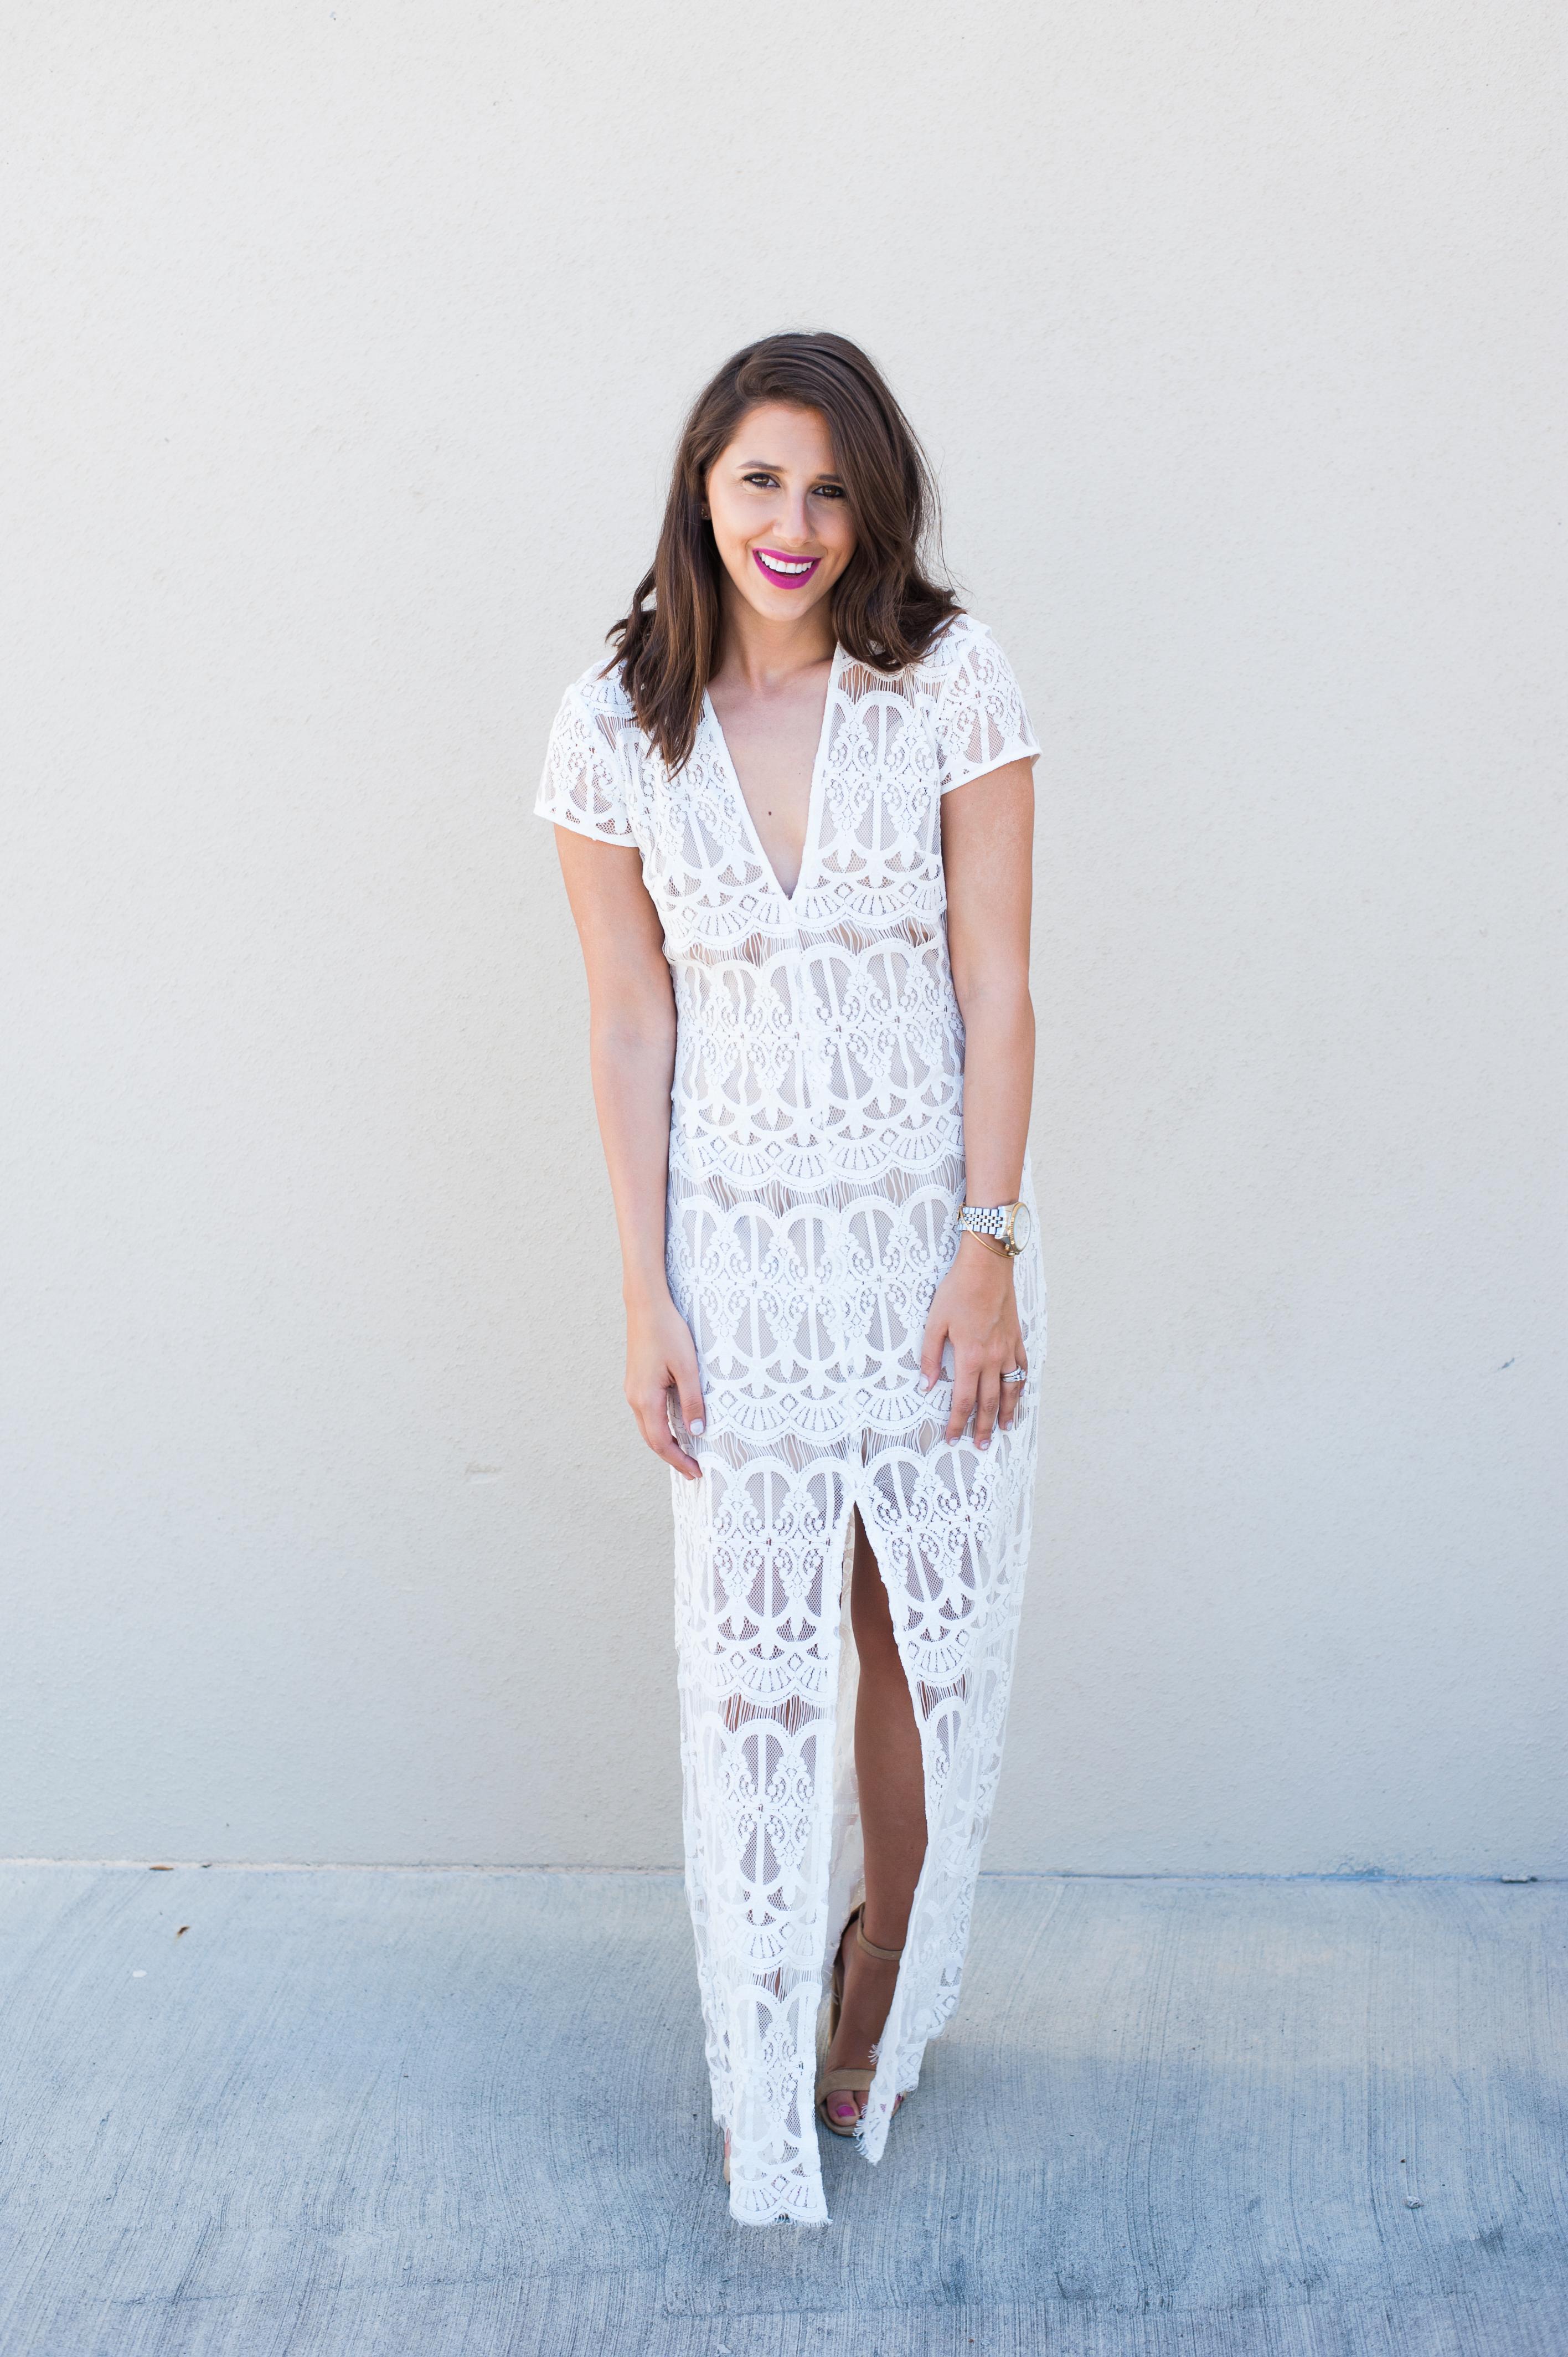 dress_up_buttercup_dede_raad_houston_fashion_fashion_blog_cartoonnetwork_dressupwho_Wayf-V-Neck Lace Maxi Dress (4 of 11)